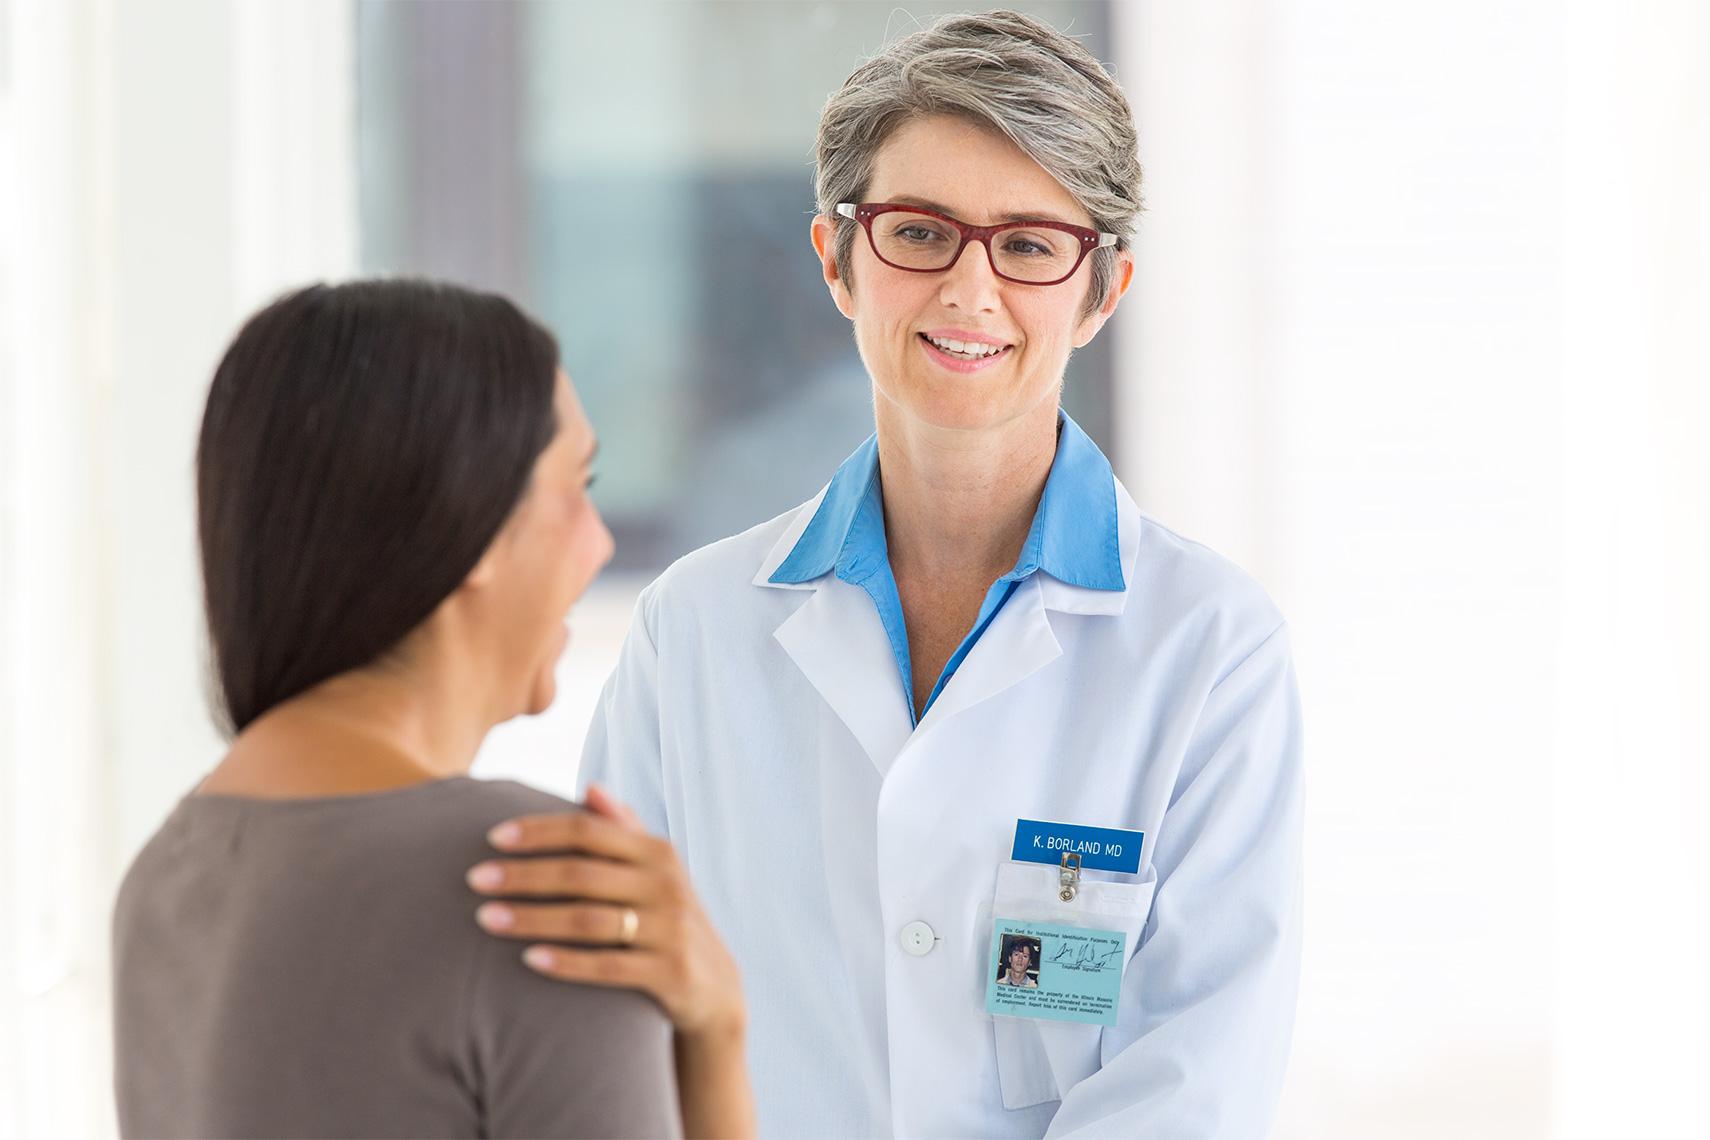 Female-Doctor-Female-Patient-2-92-1web.jpg